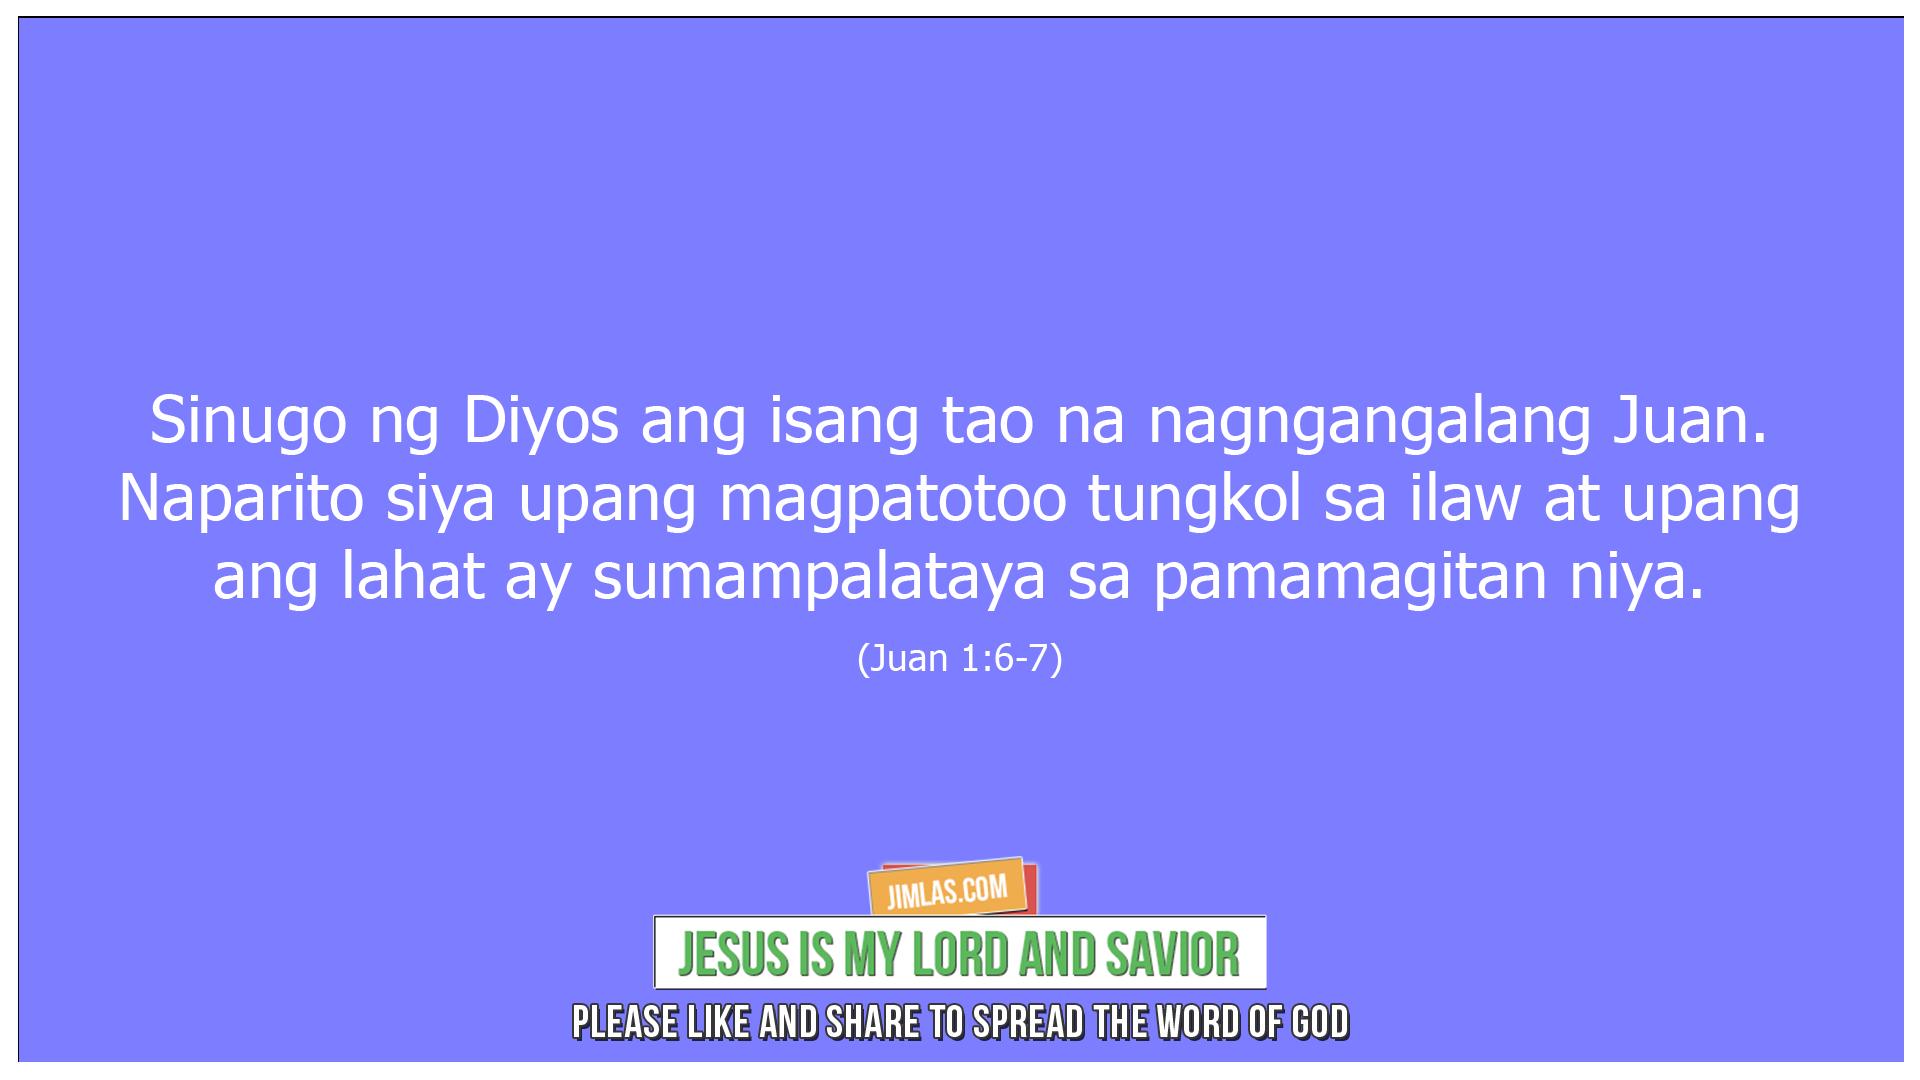 Juan 1 6-7, Juan 1:6-7